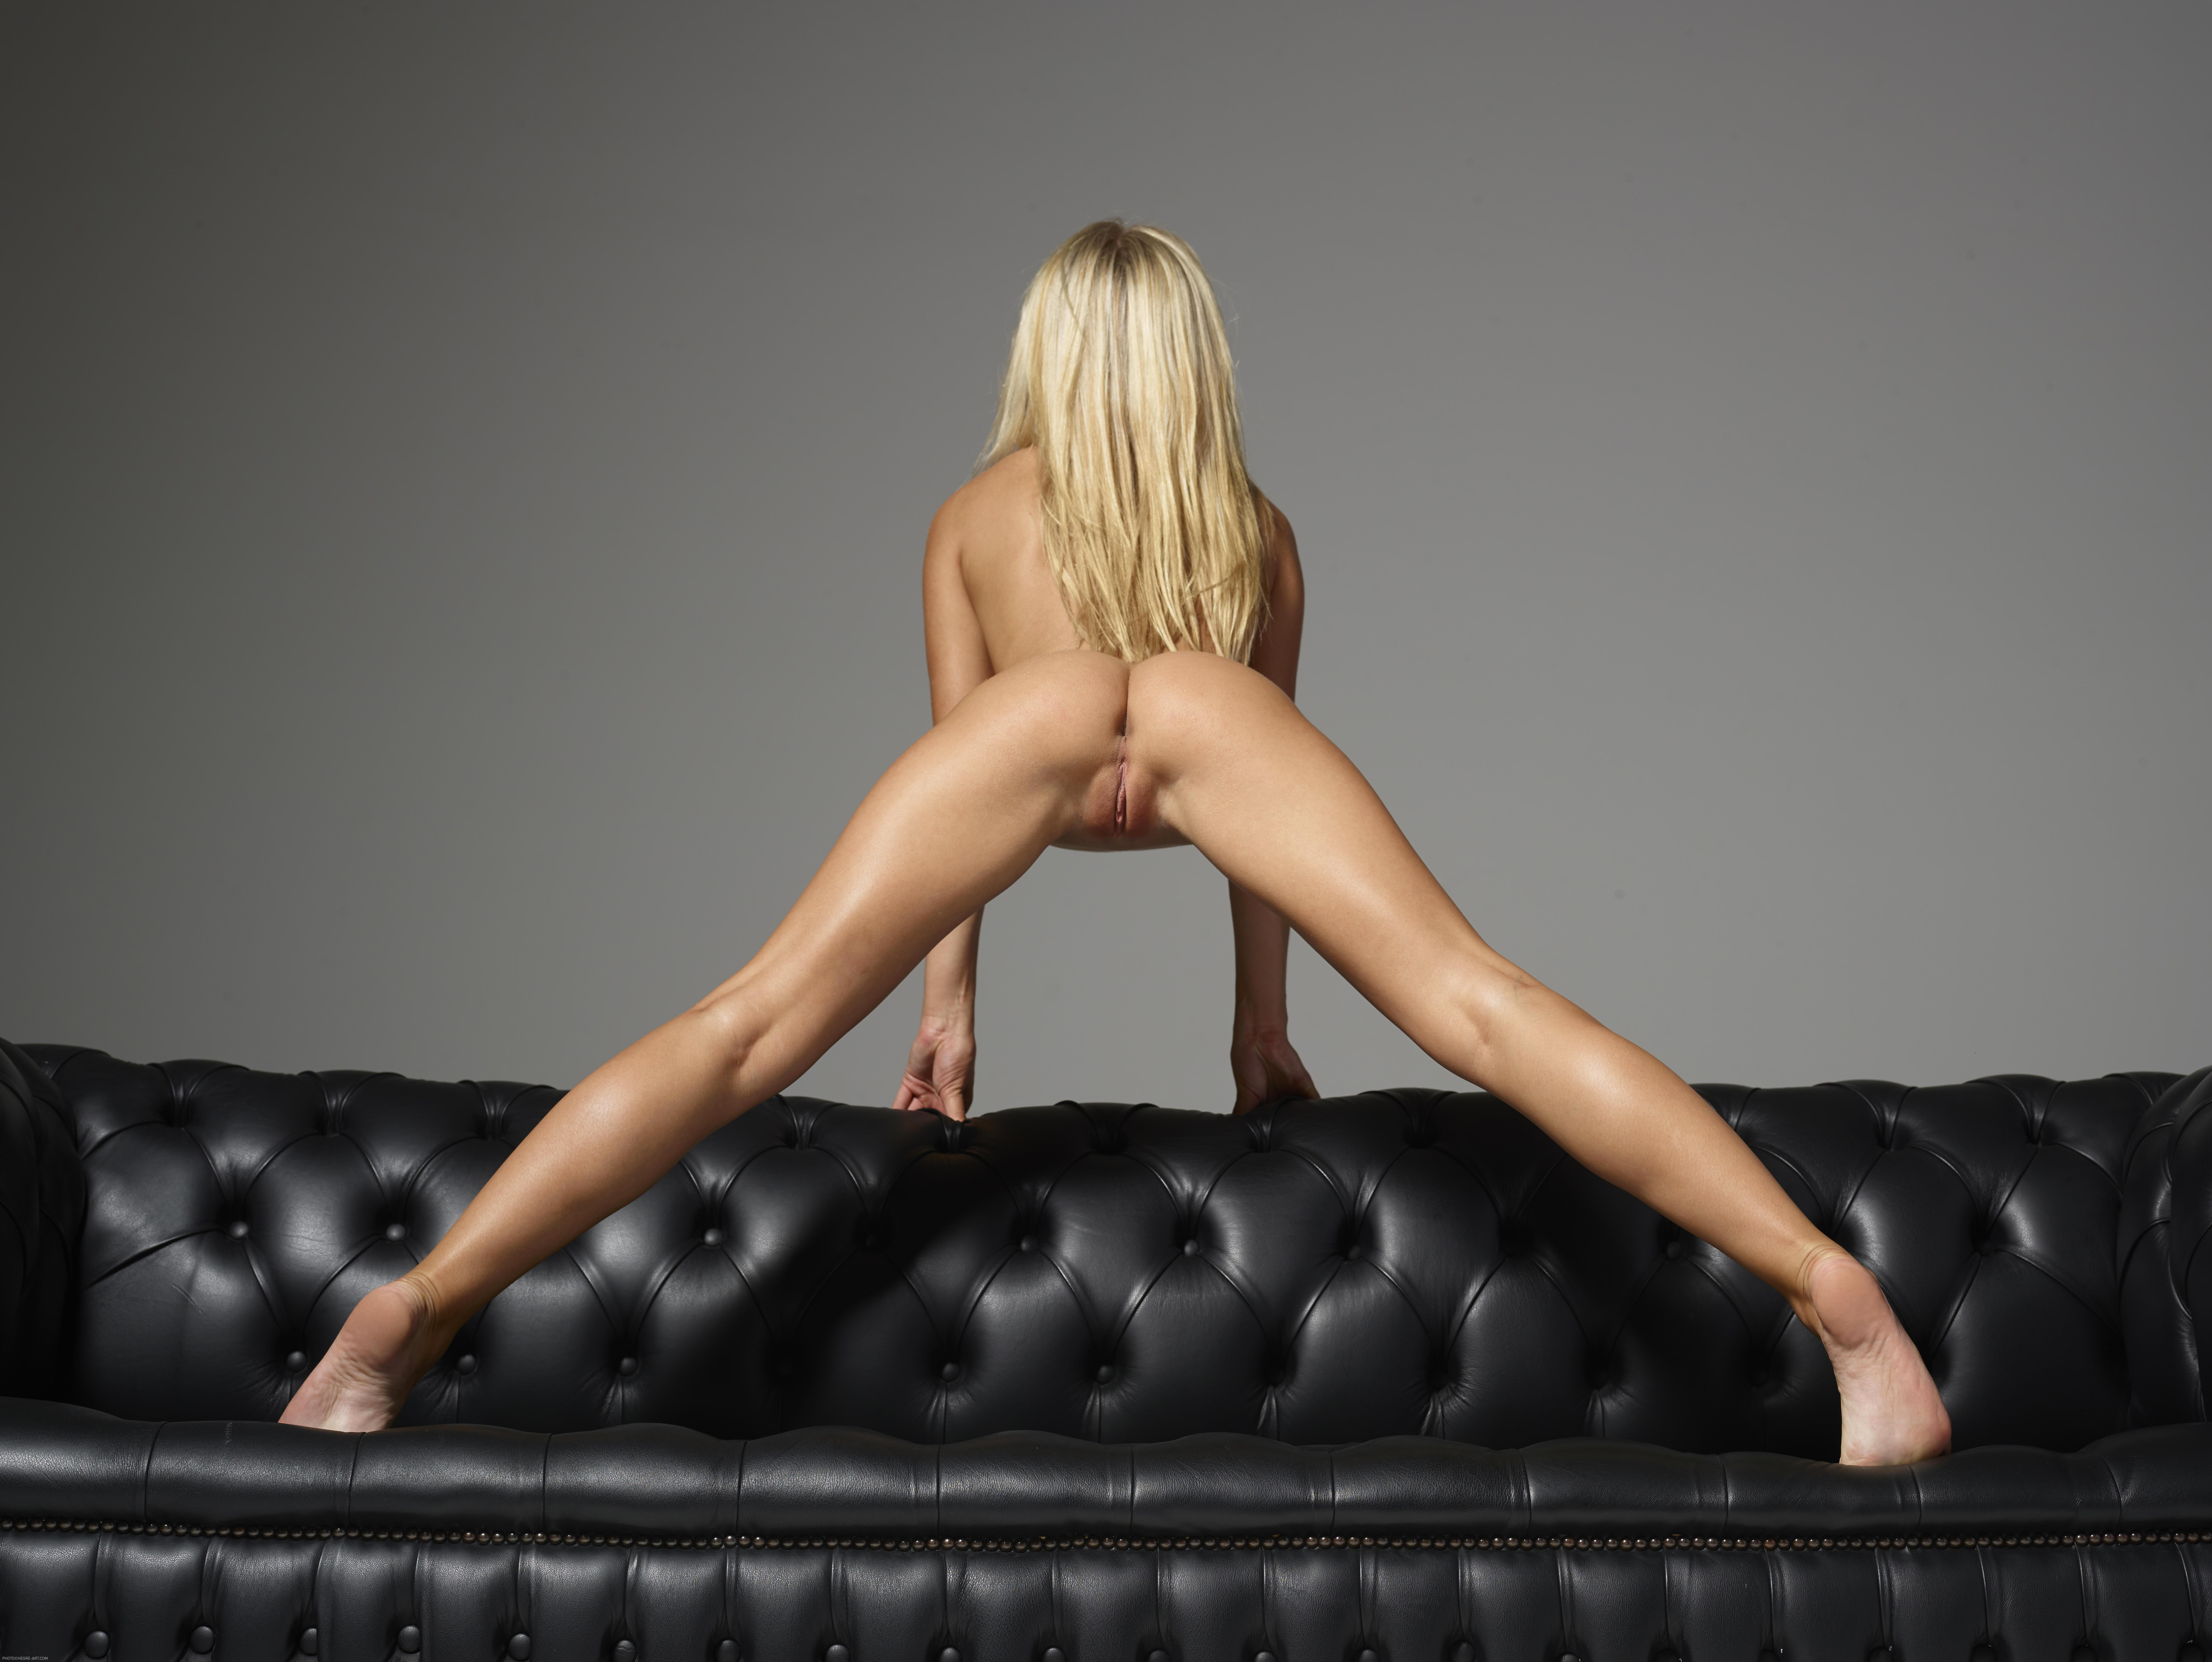 Spread eagle blonde bed nude